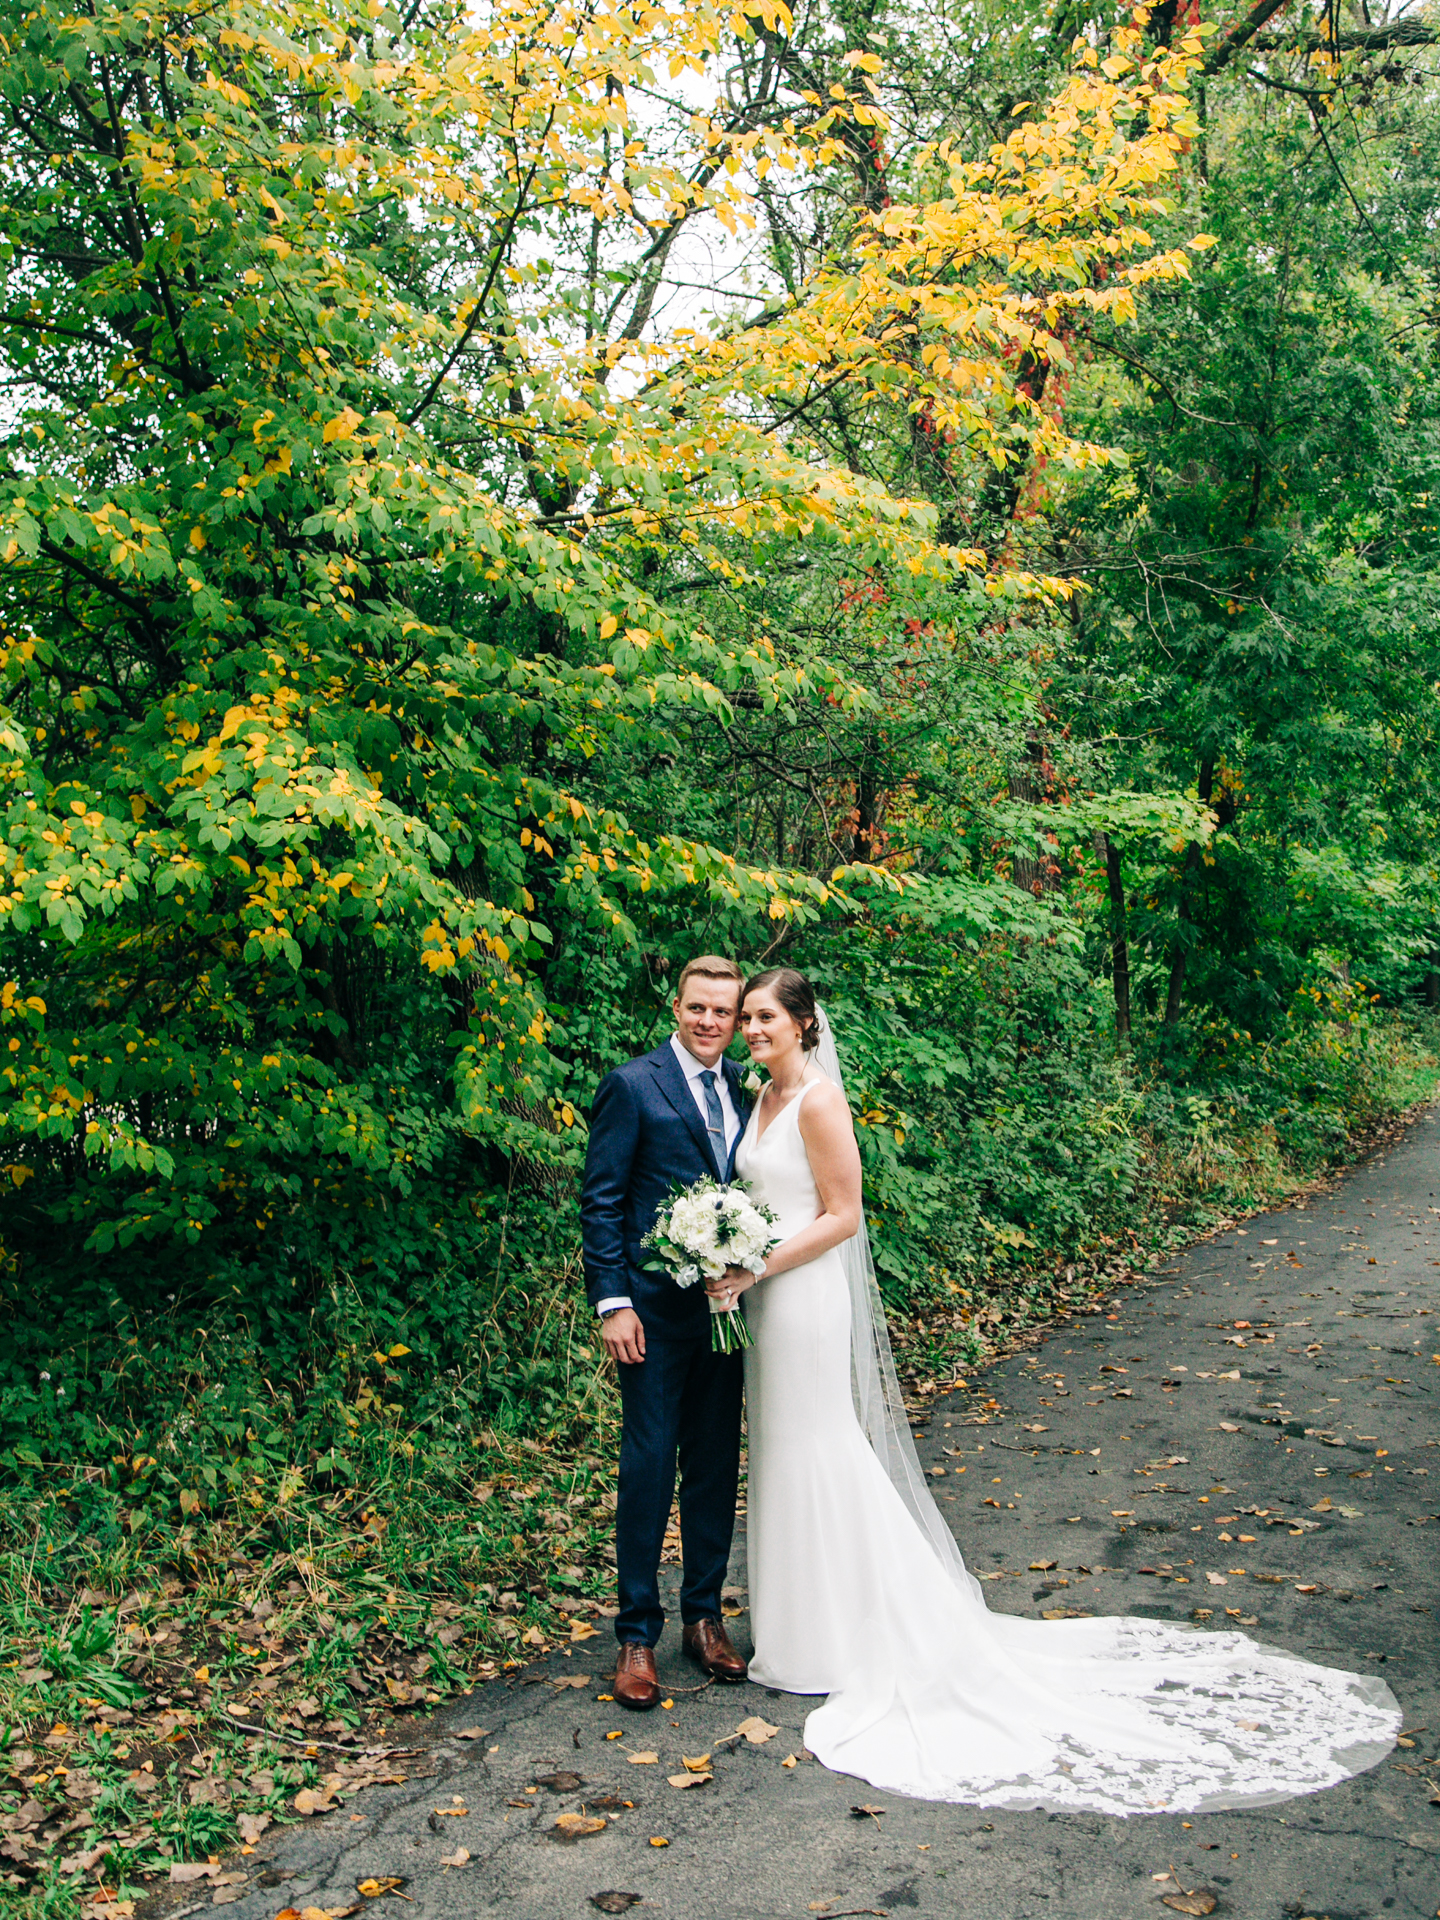 jan2018_jimbrodie_wedding-portfolio-151.jpg